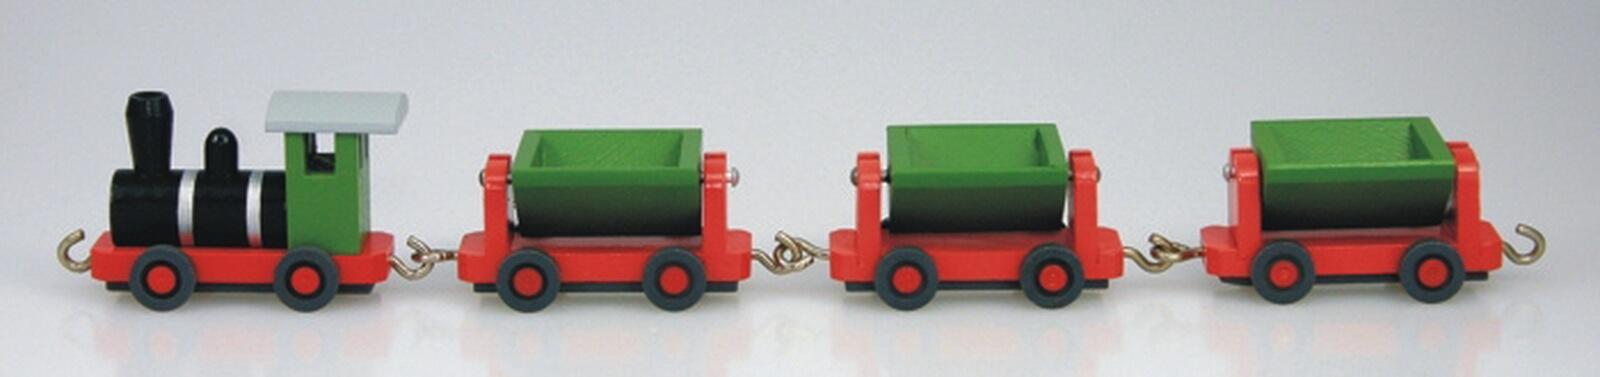 Grubenbahn aus Holz, farbig von Stephan Kaden